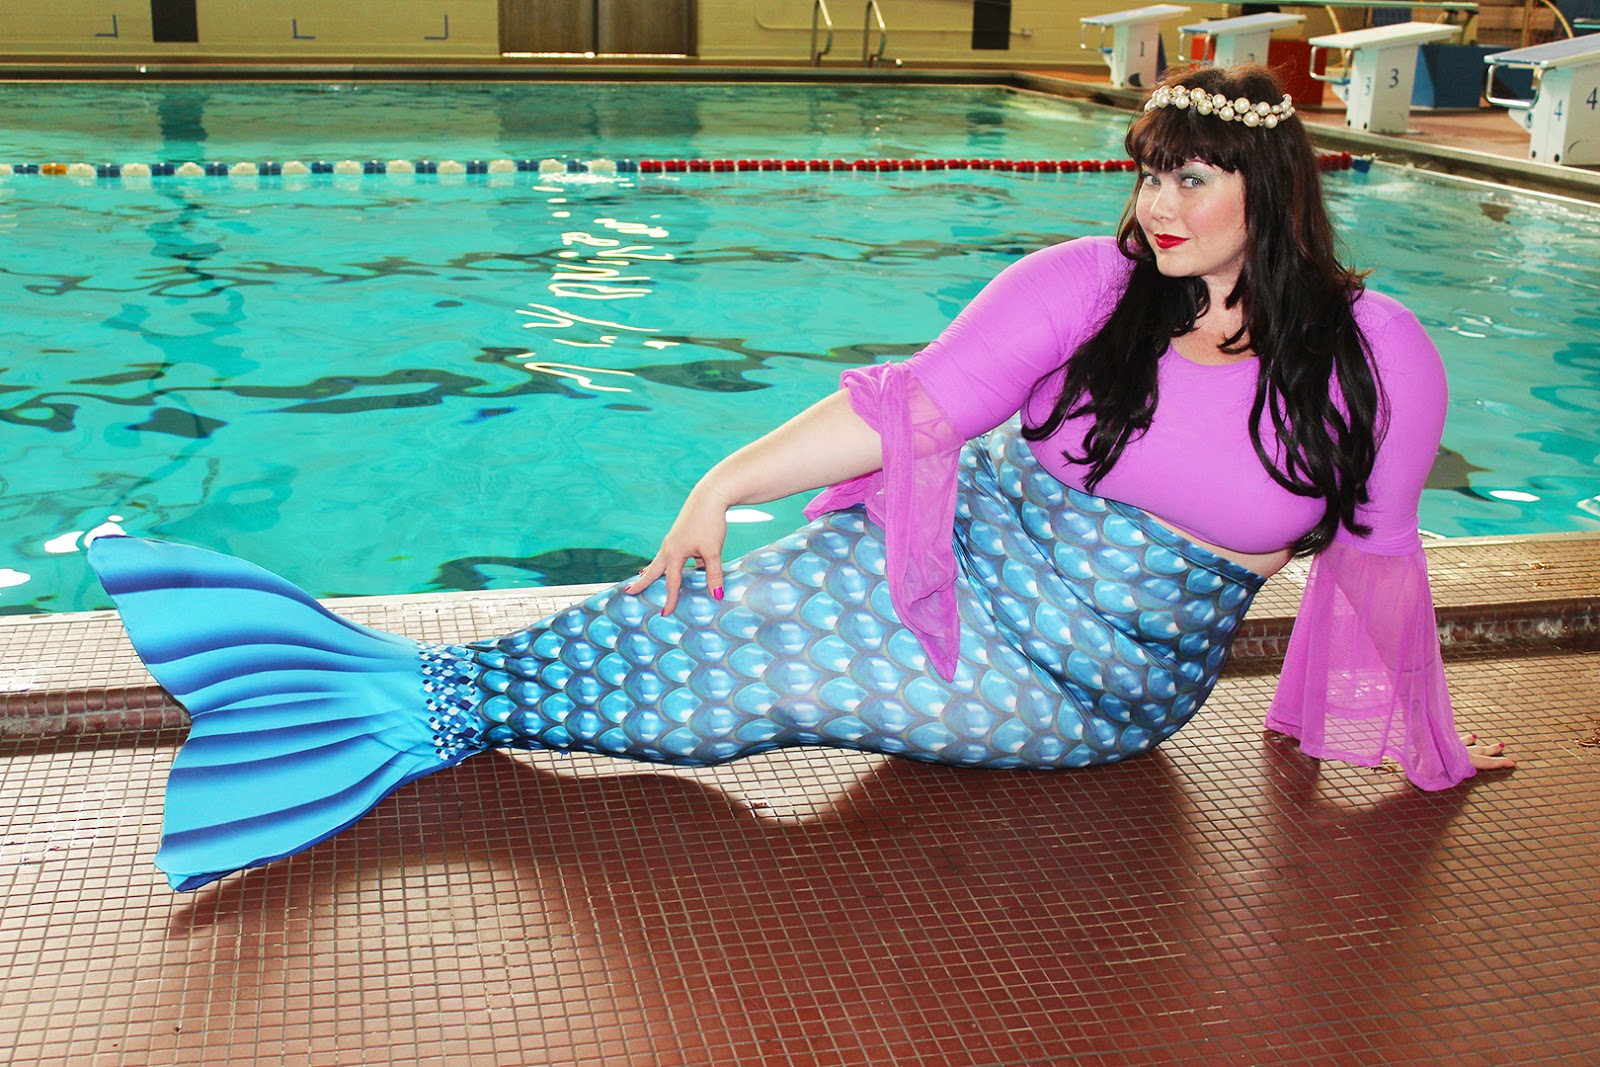 Plus Size Mermaid, Mermaid, Aquamermaid, mermaid classes, mermaid Chicago, Plus Size blogger, Style Plus Curves